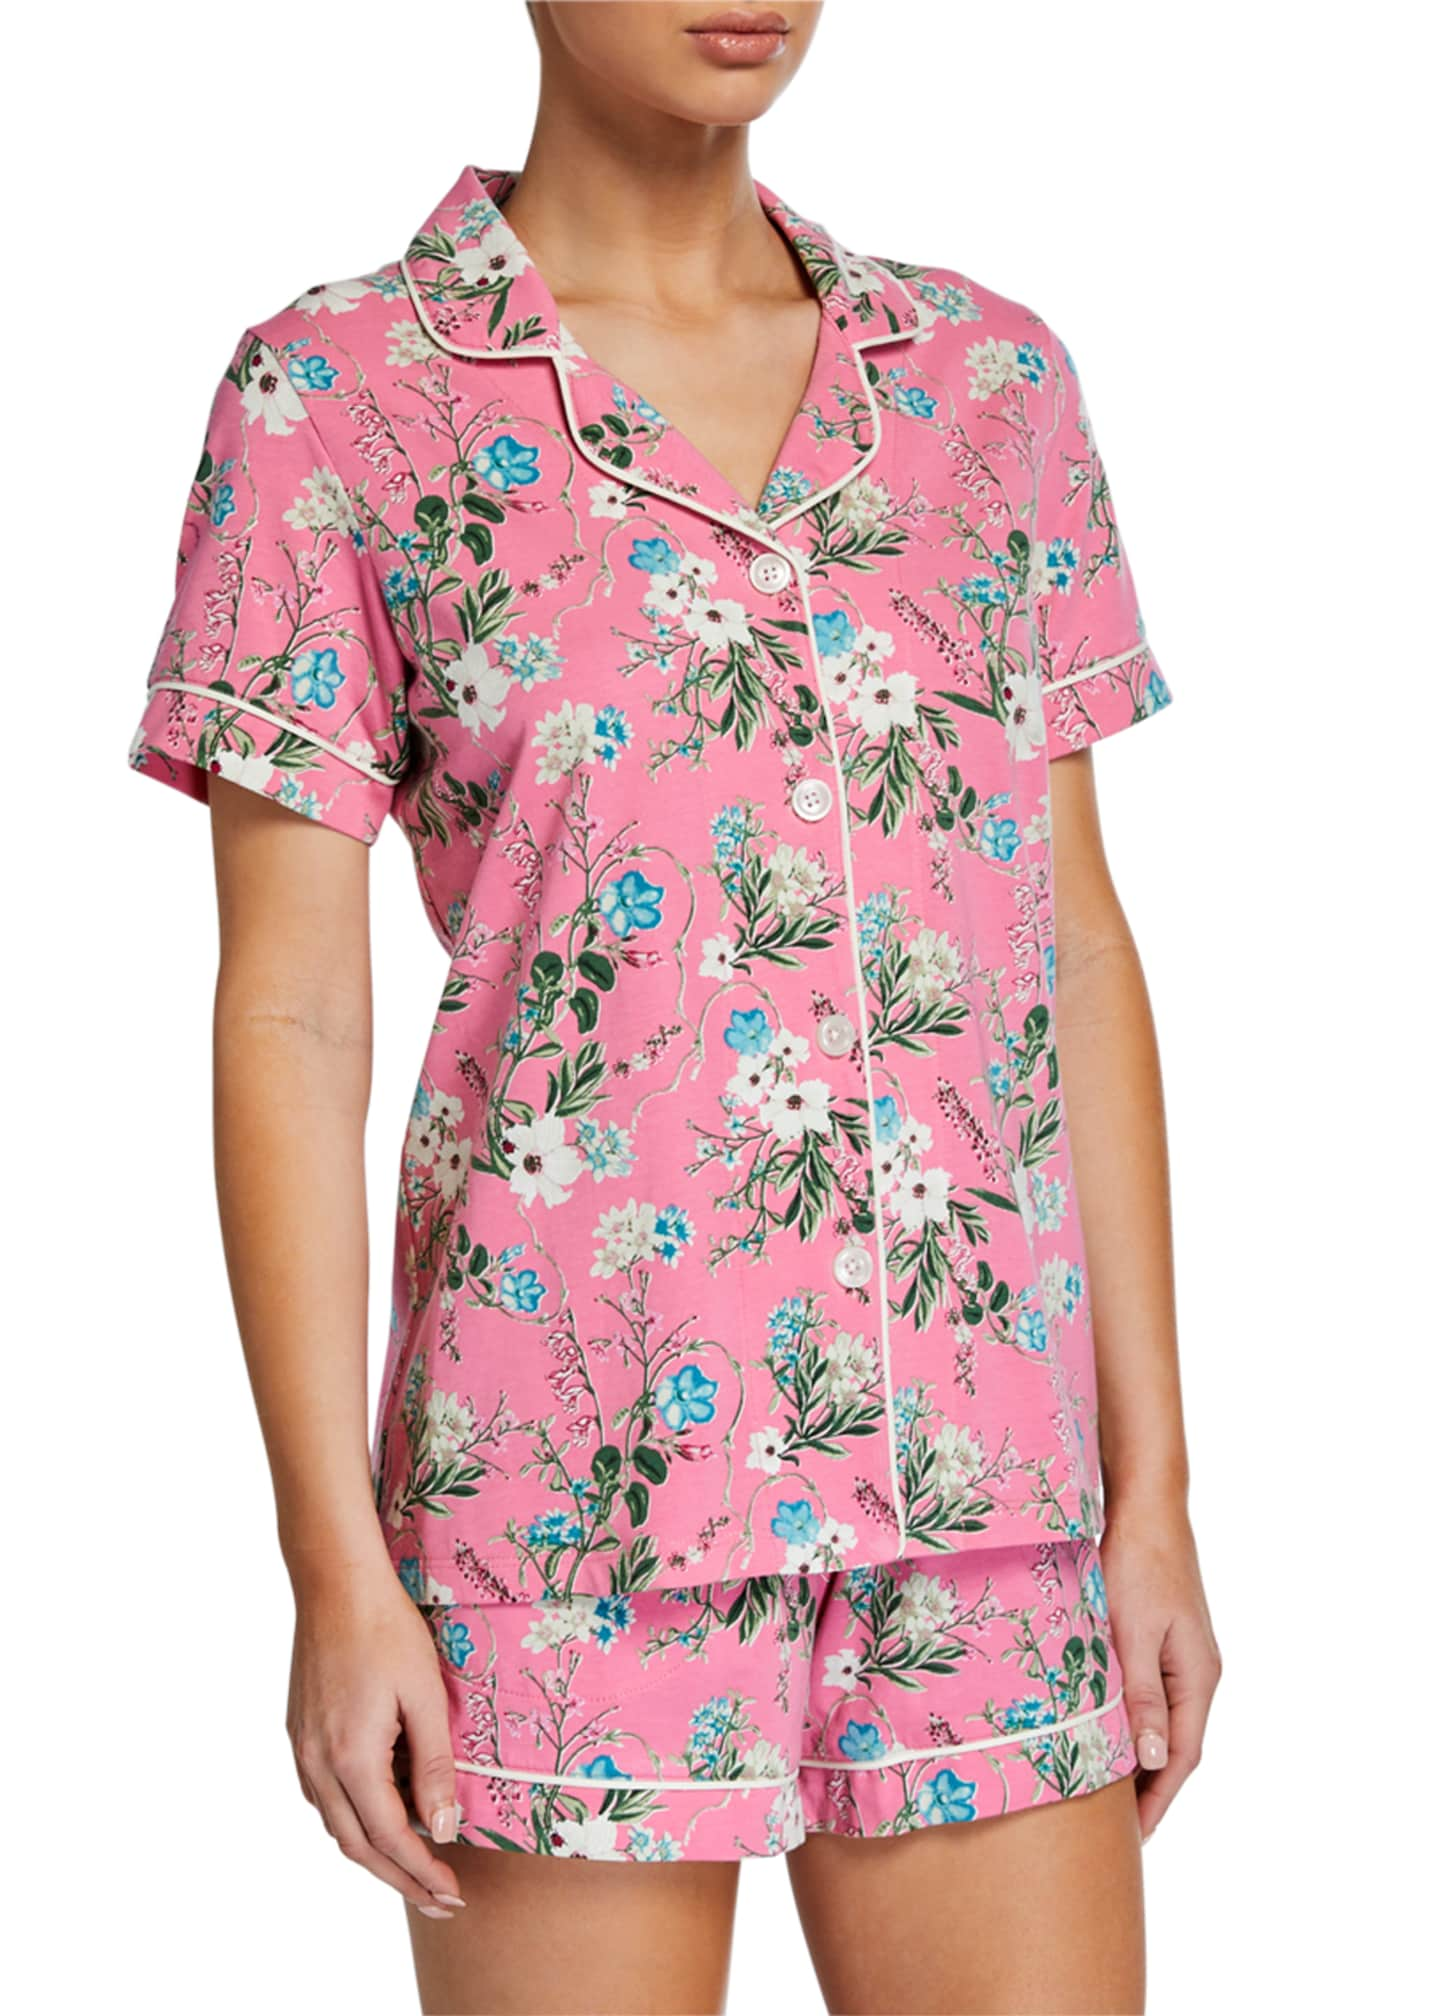 BedHead Pajamas Plus Size Ladybug Floral Shorty Pajama